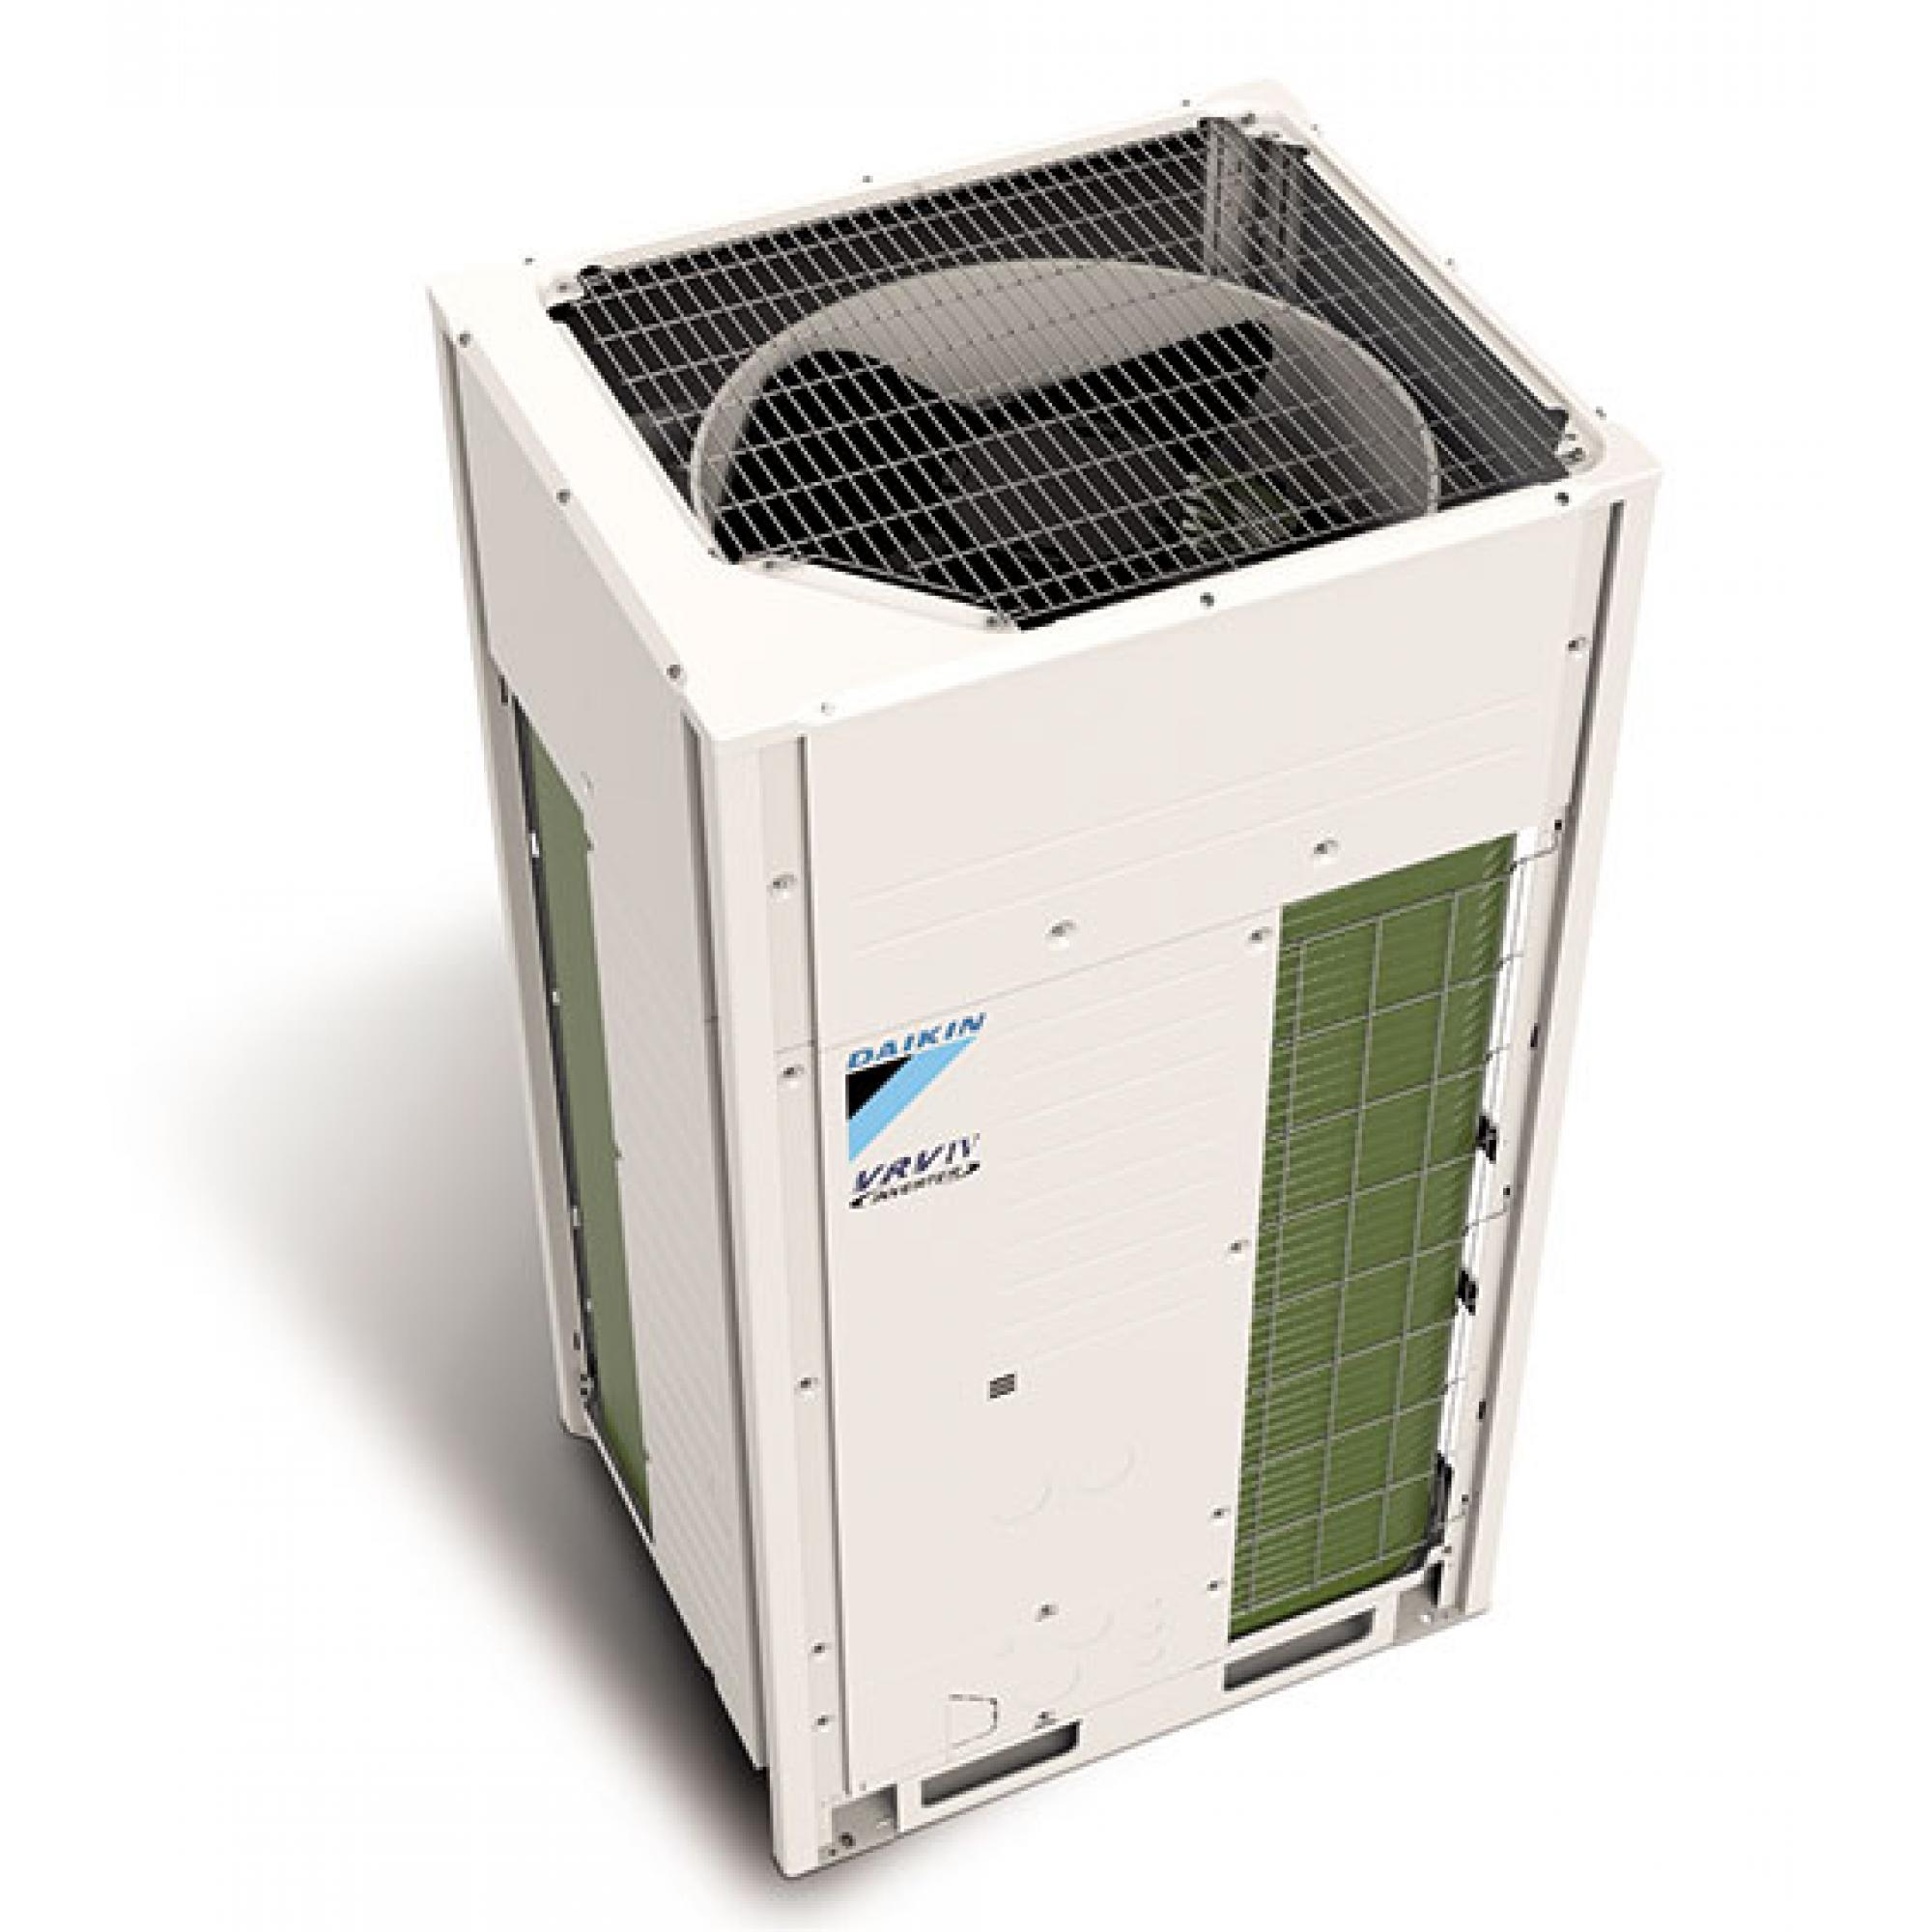 Aire acondicionado rxyq14t for Aire acondicionado aparato exterior